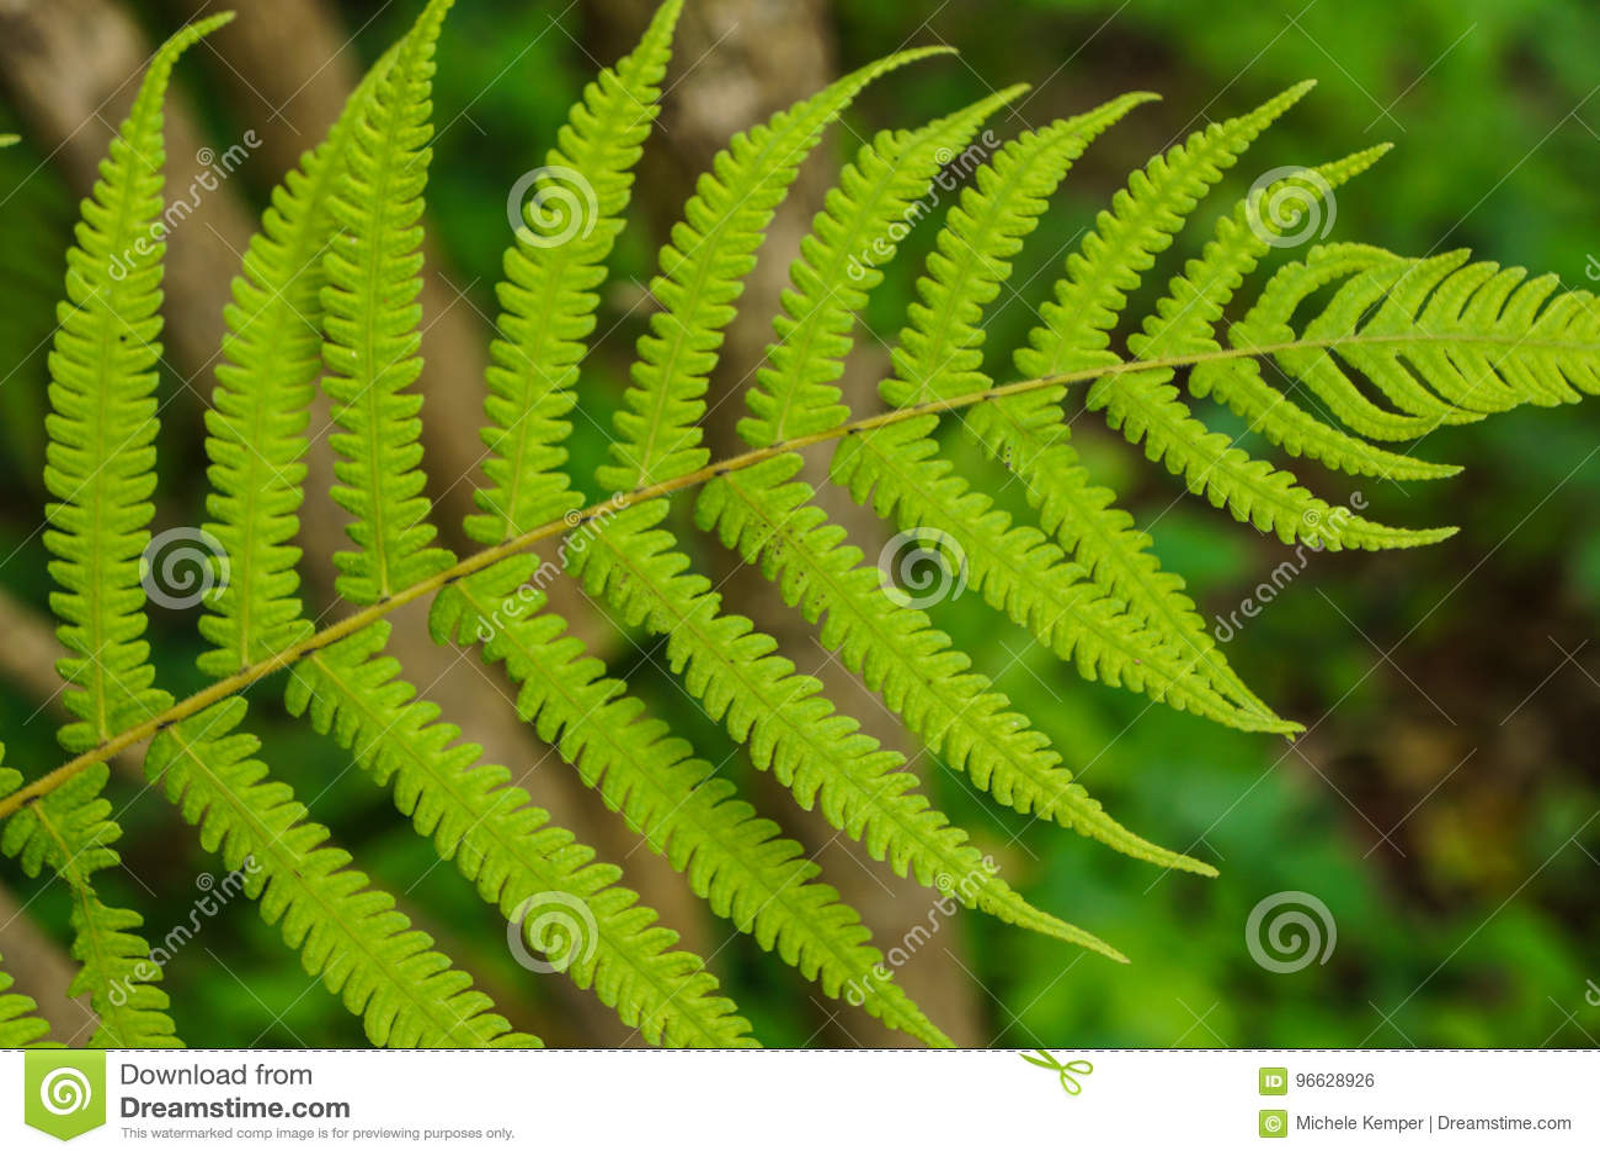 Fern Frond closeup stock photo  Image of branch, foliage - 96628926